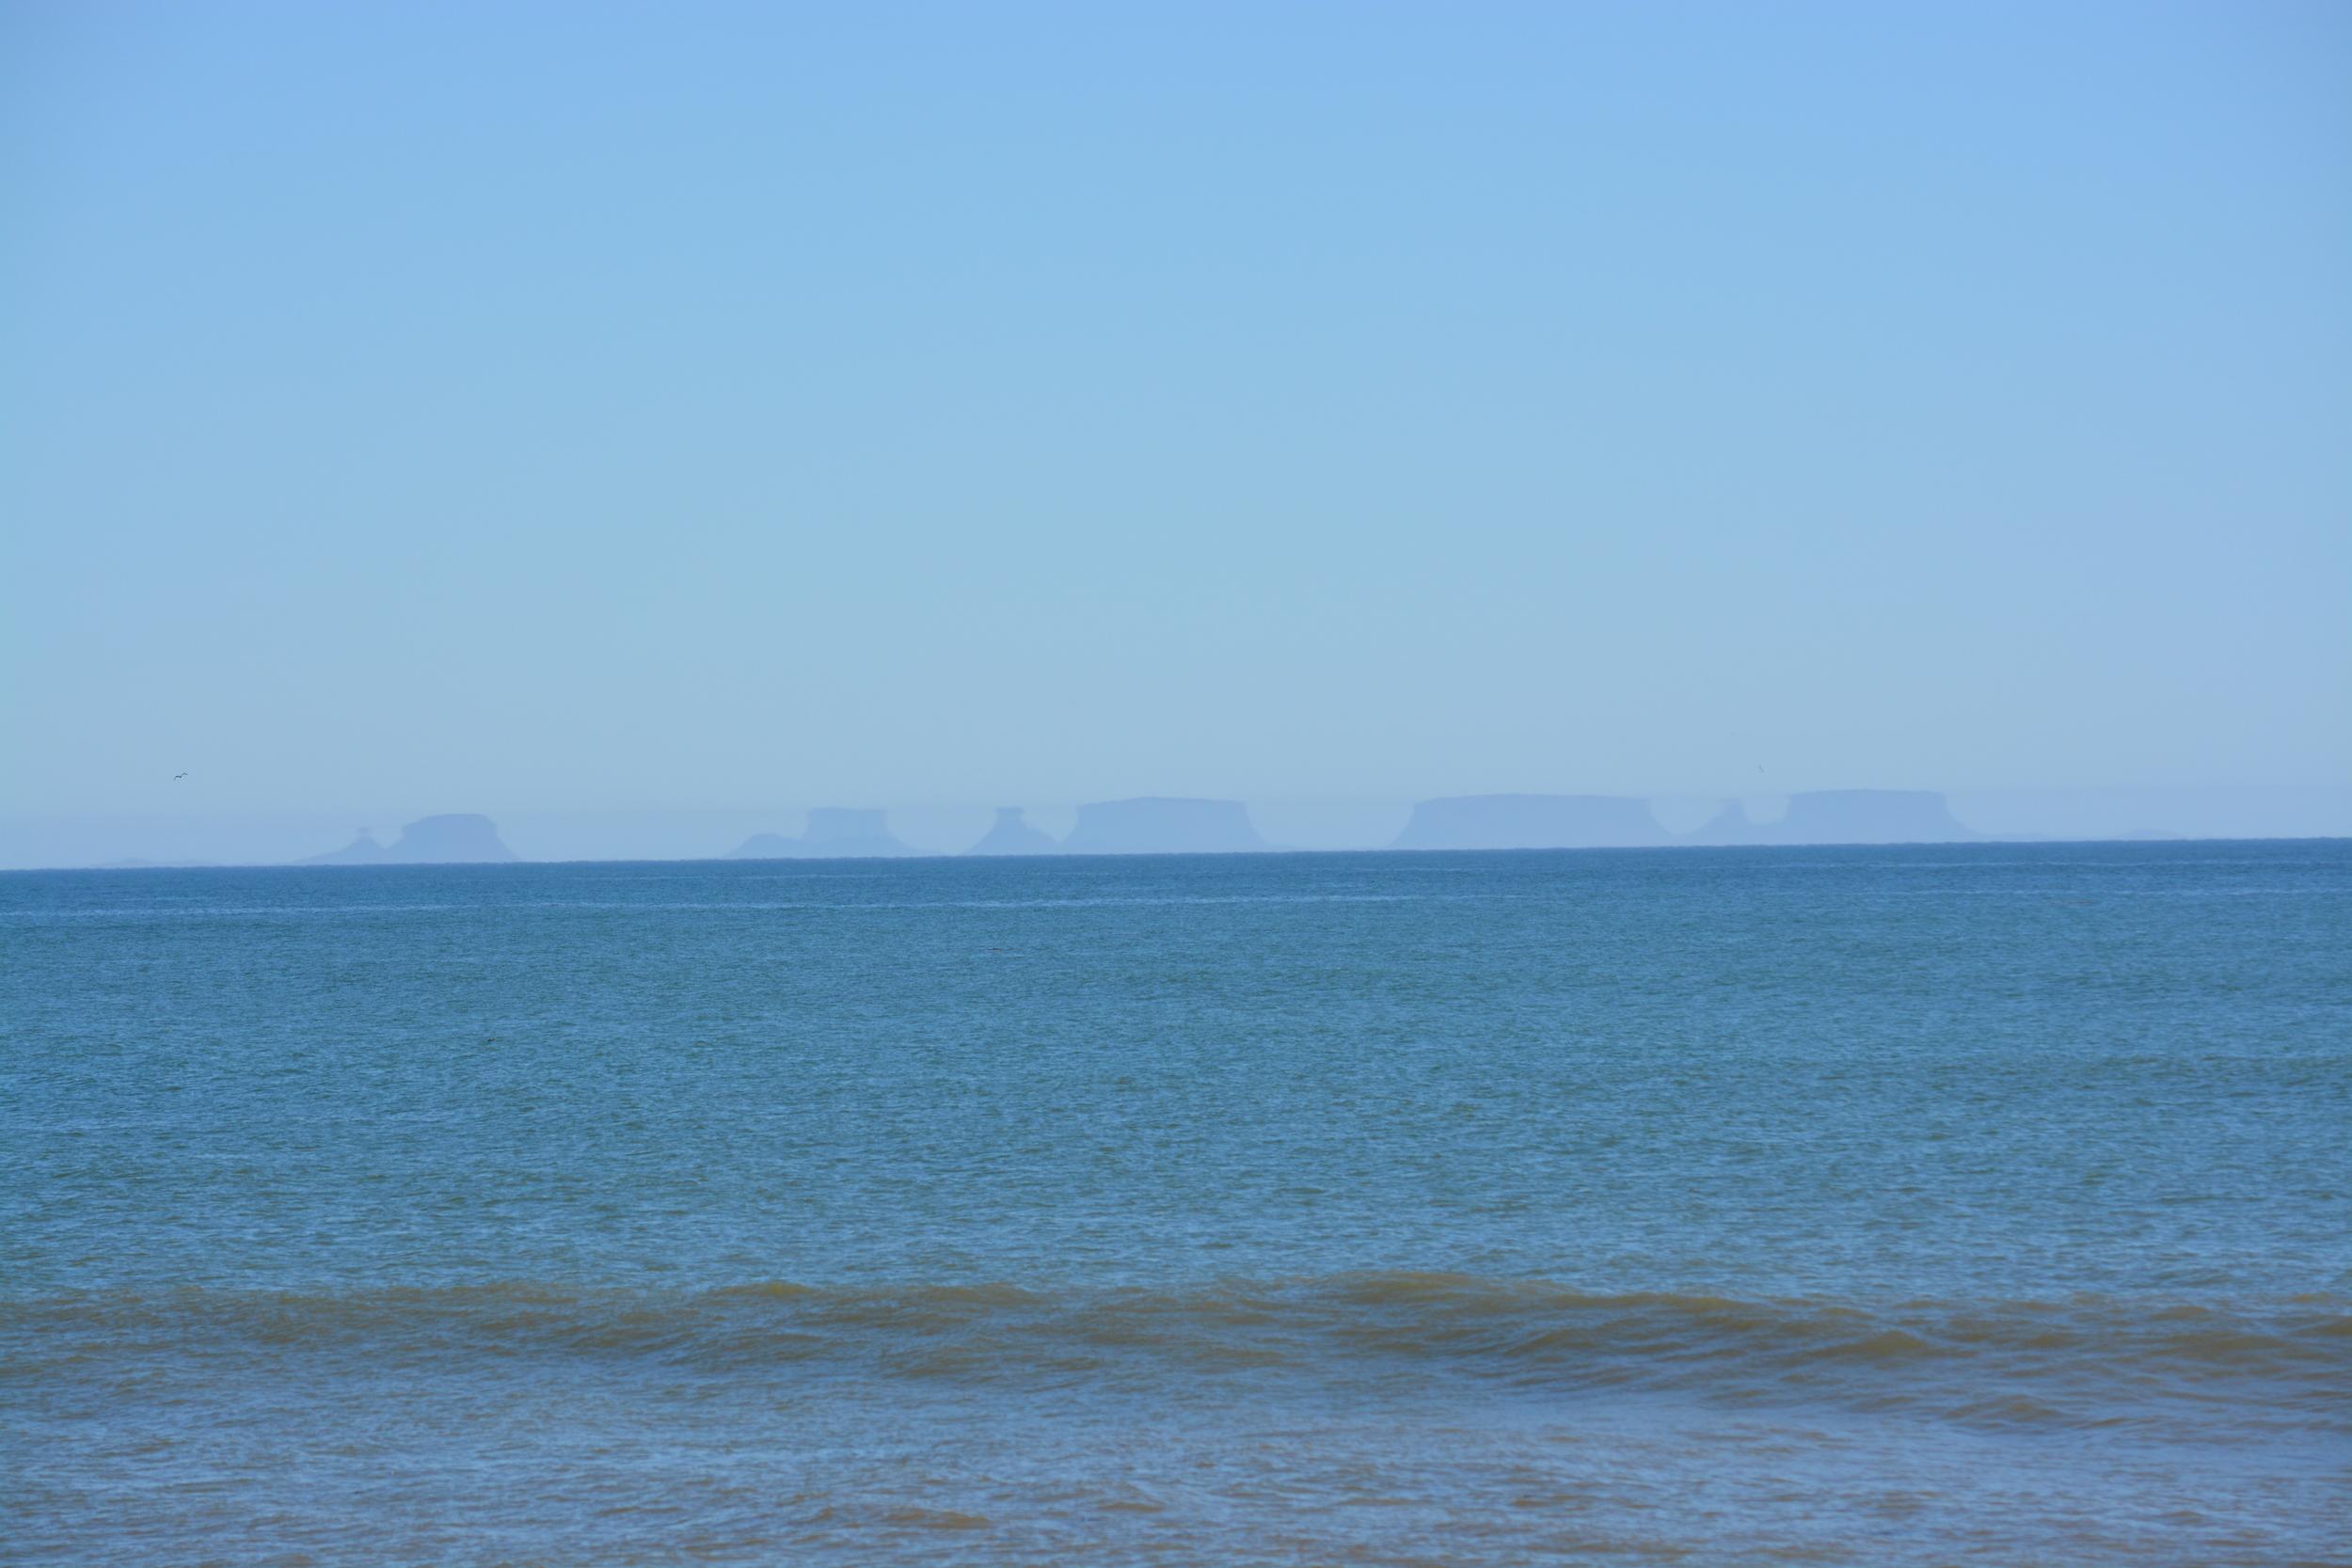 Baja California 10-5-13 Shipwrecks Surfing Adventure Ocean Experience Surf School San Diego (79).JPG